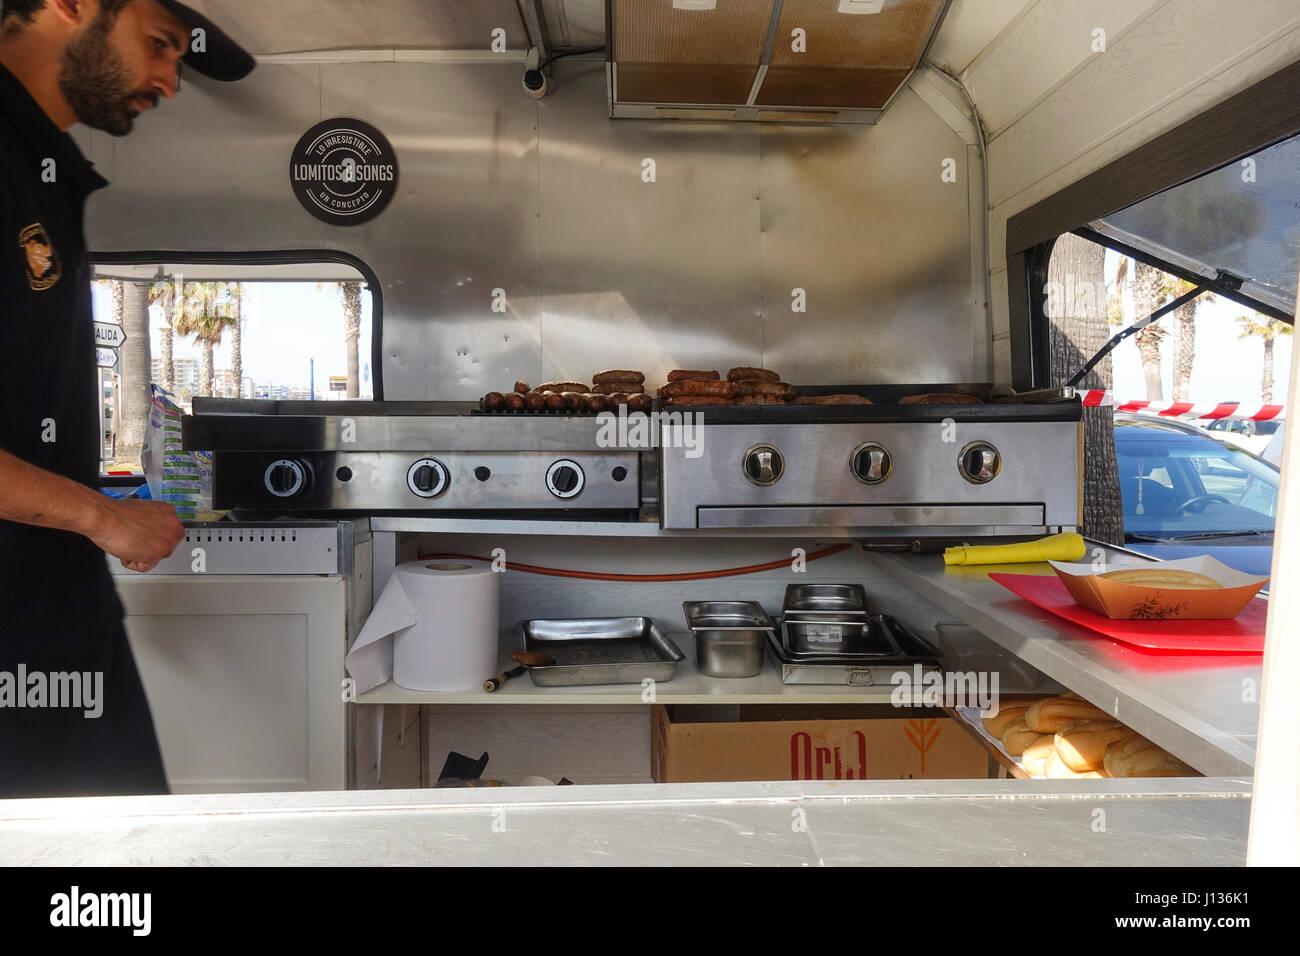 Man Preparing Sausages, View Inside Food Truck, Interior. Spain.